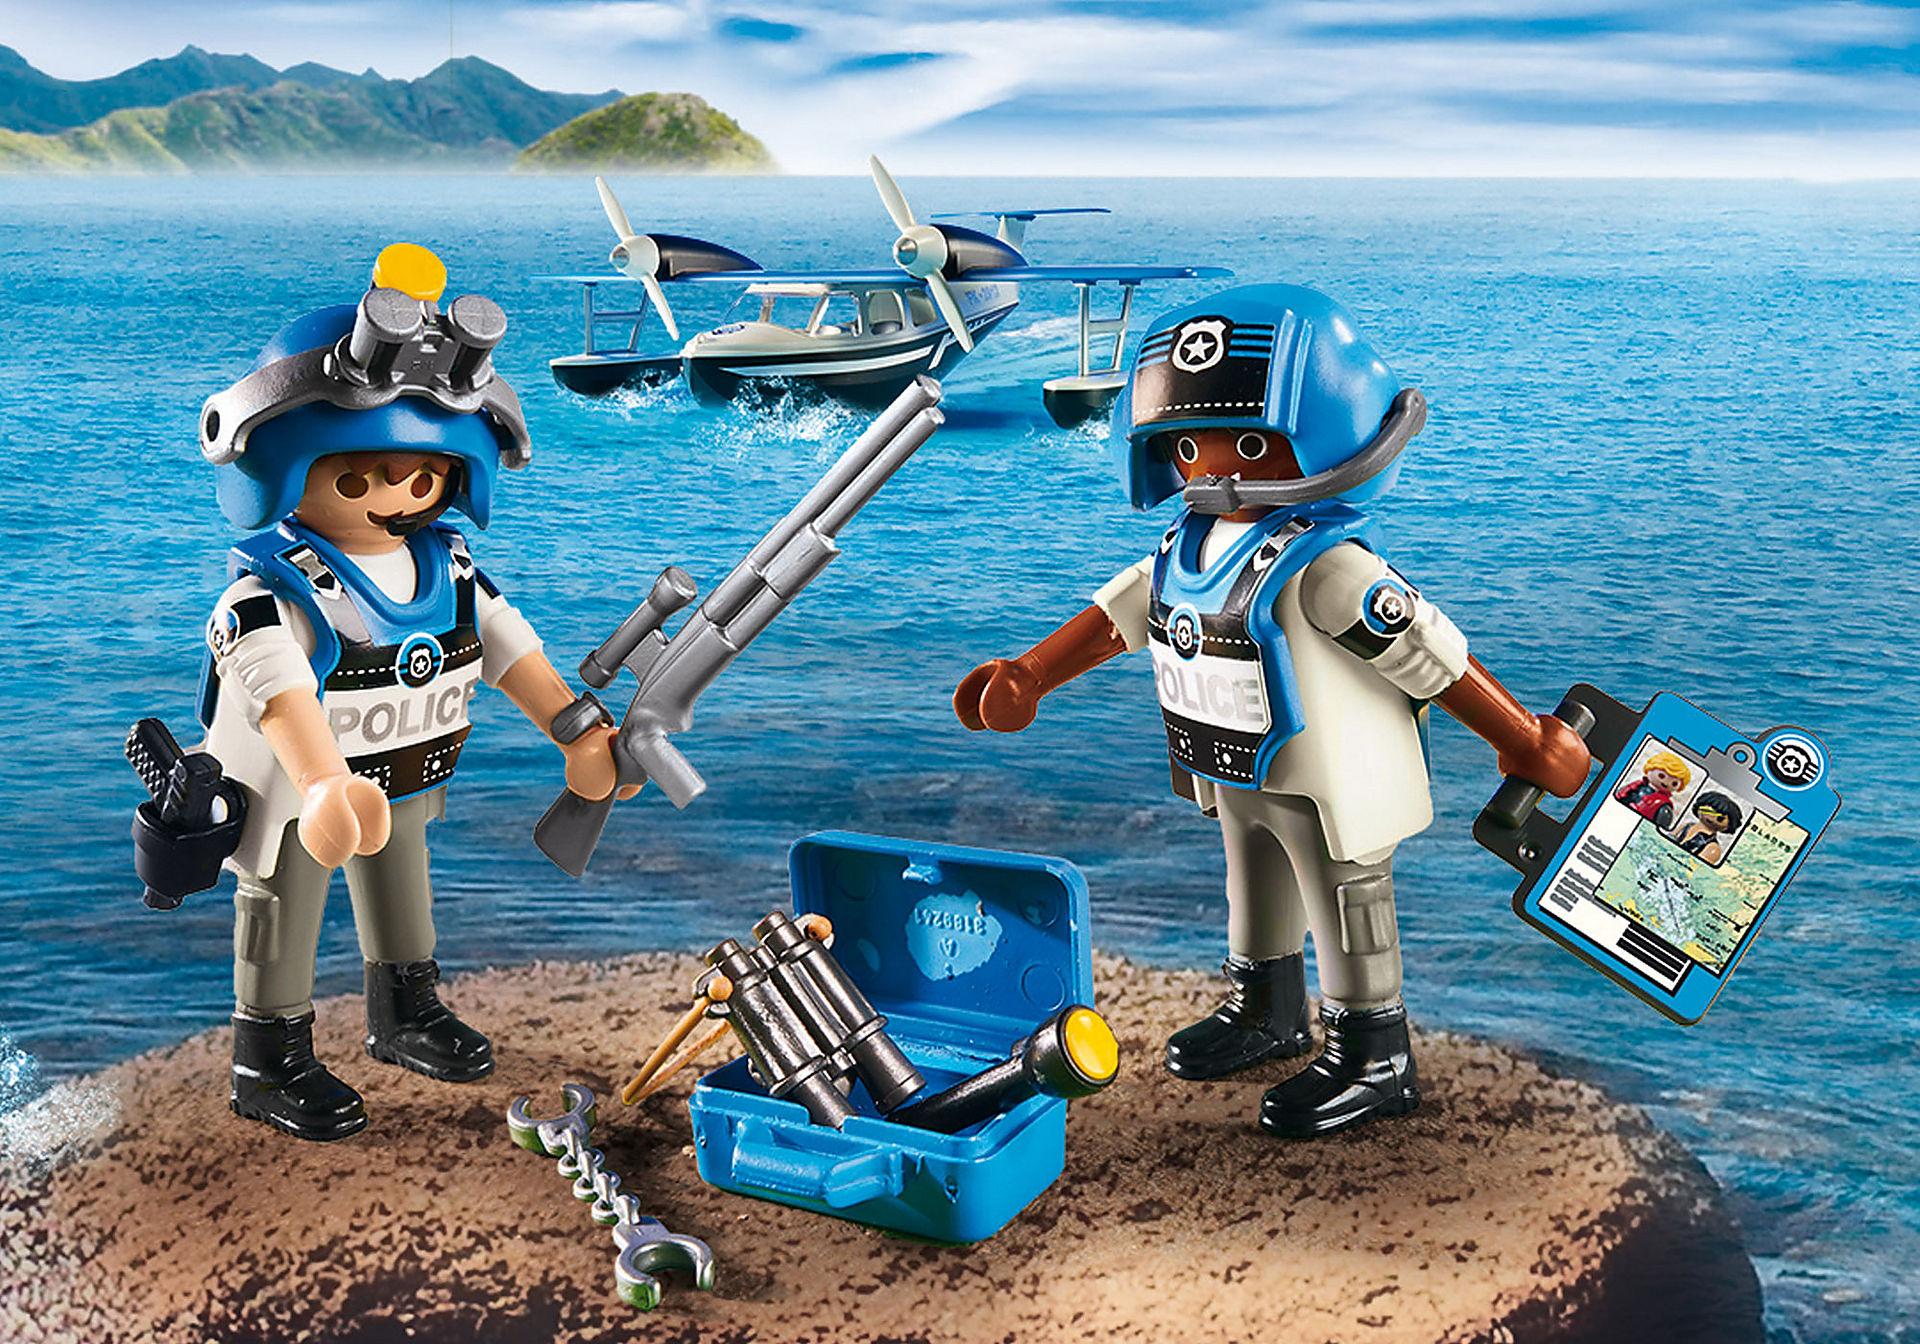 http://media.playmobil.com/i/playmobil/9436_product_extra1/Police Seaplane